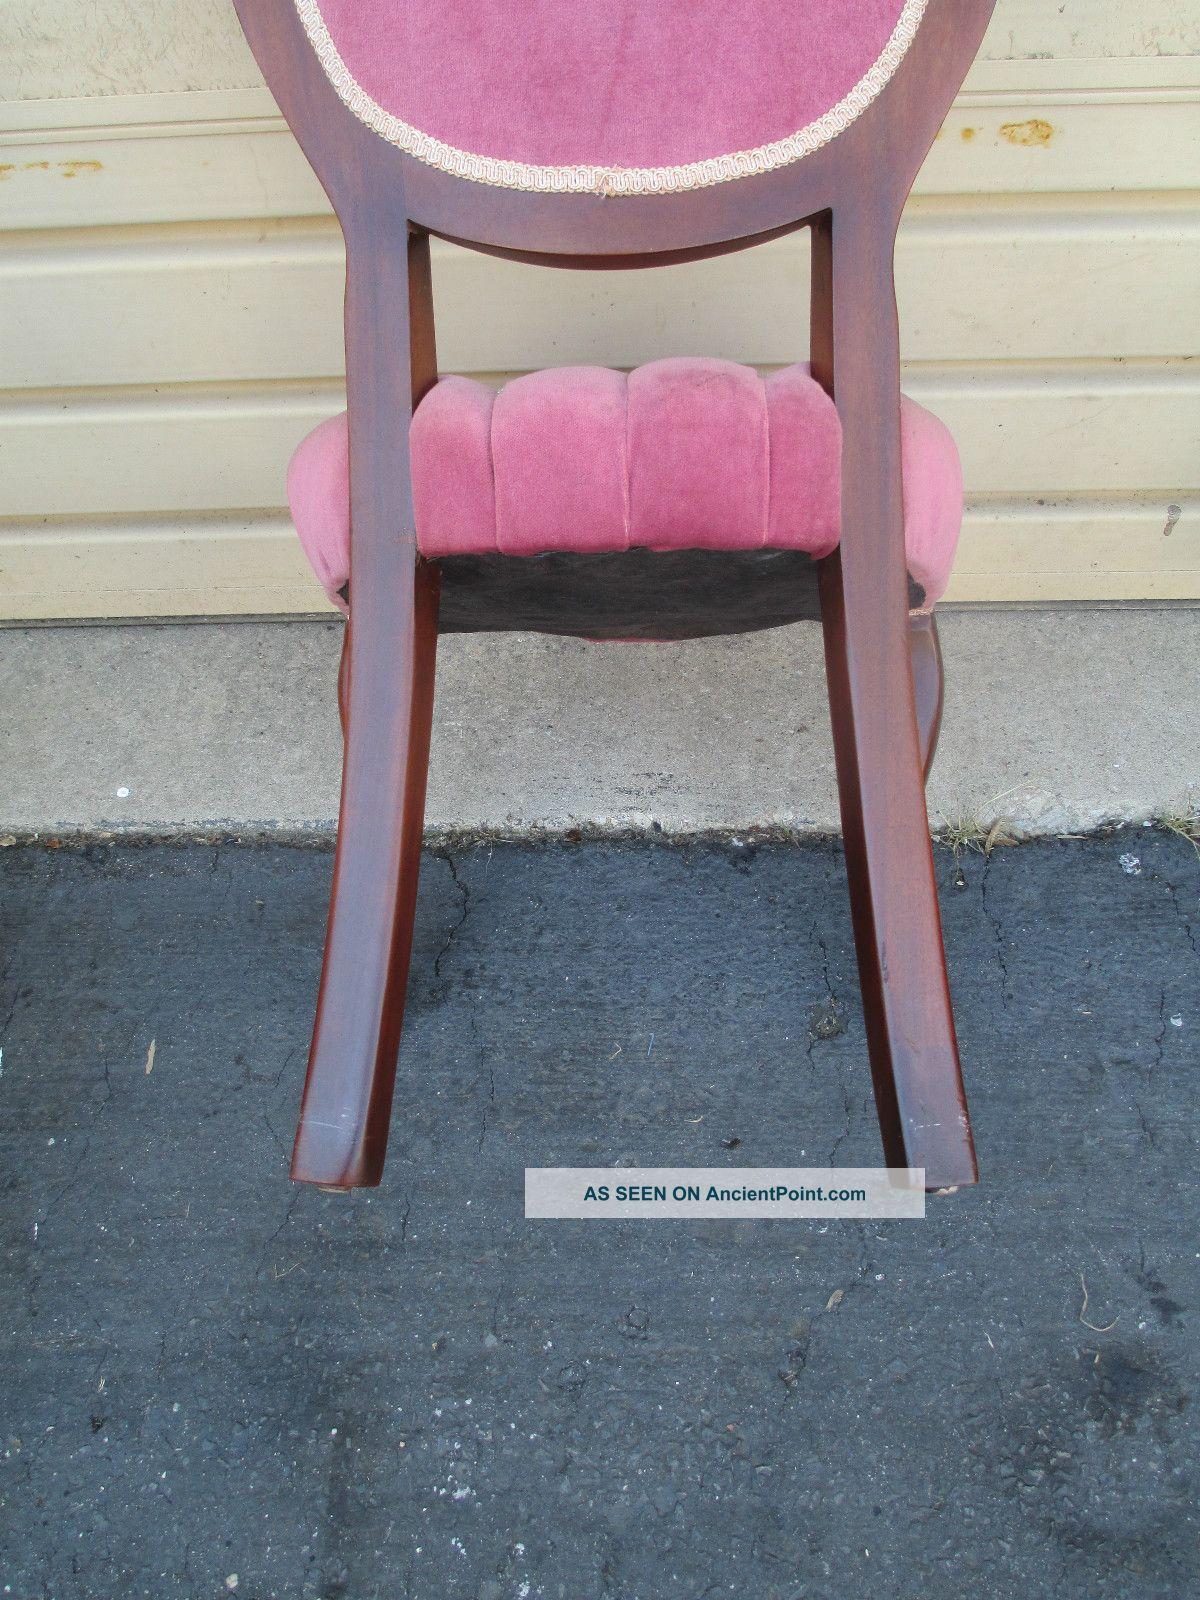 Kimball Victorian Furniture Kimball Victorian Furniture | Beautiful Scenery Photography